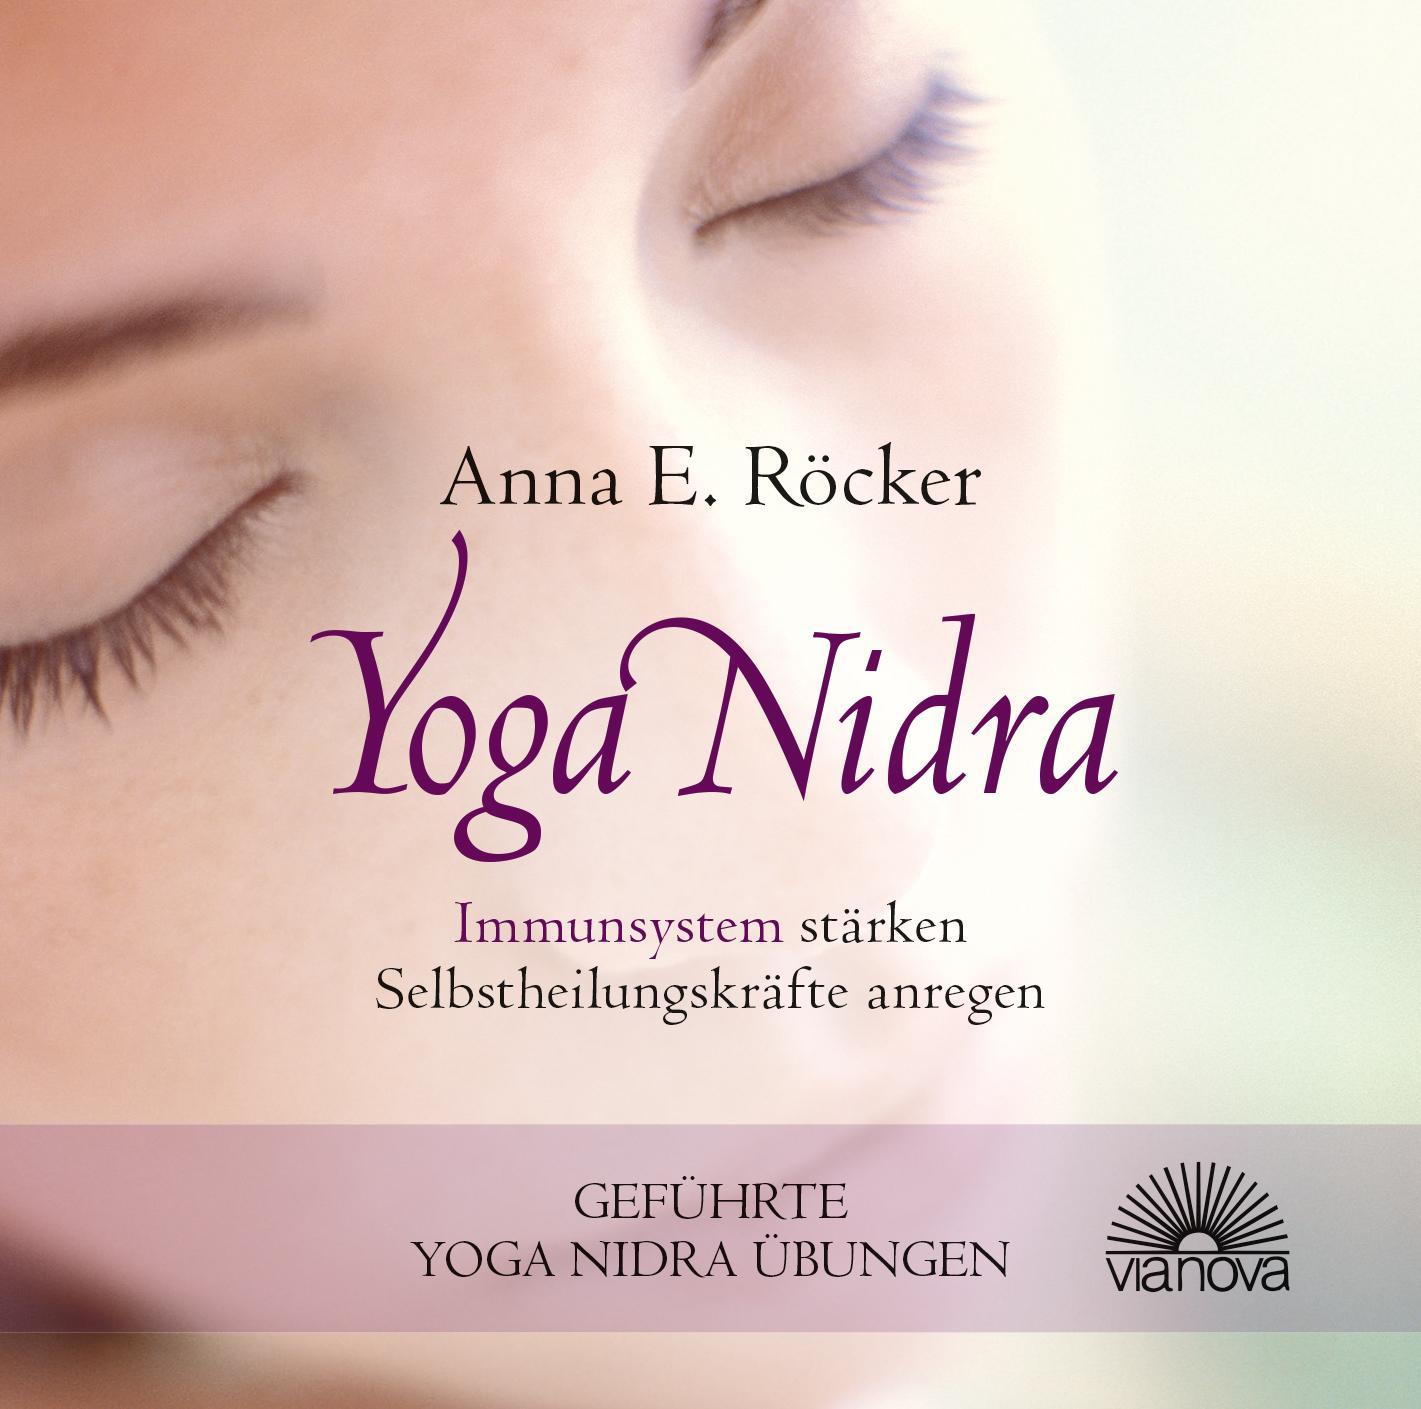 Yoga Nidra - Immunsystem stärken - Selbstheilungskräfte anregen - Geführte  ...